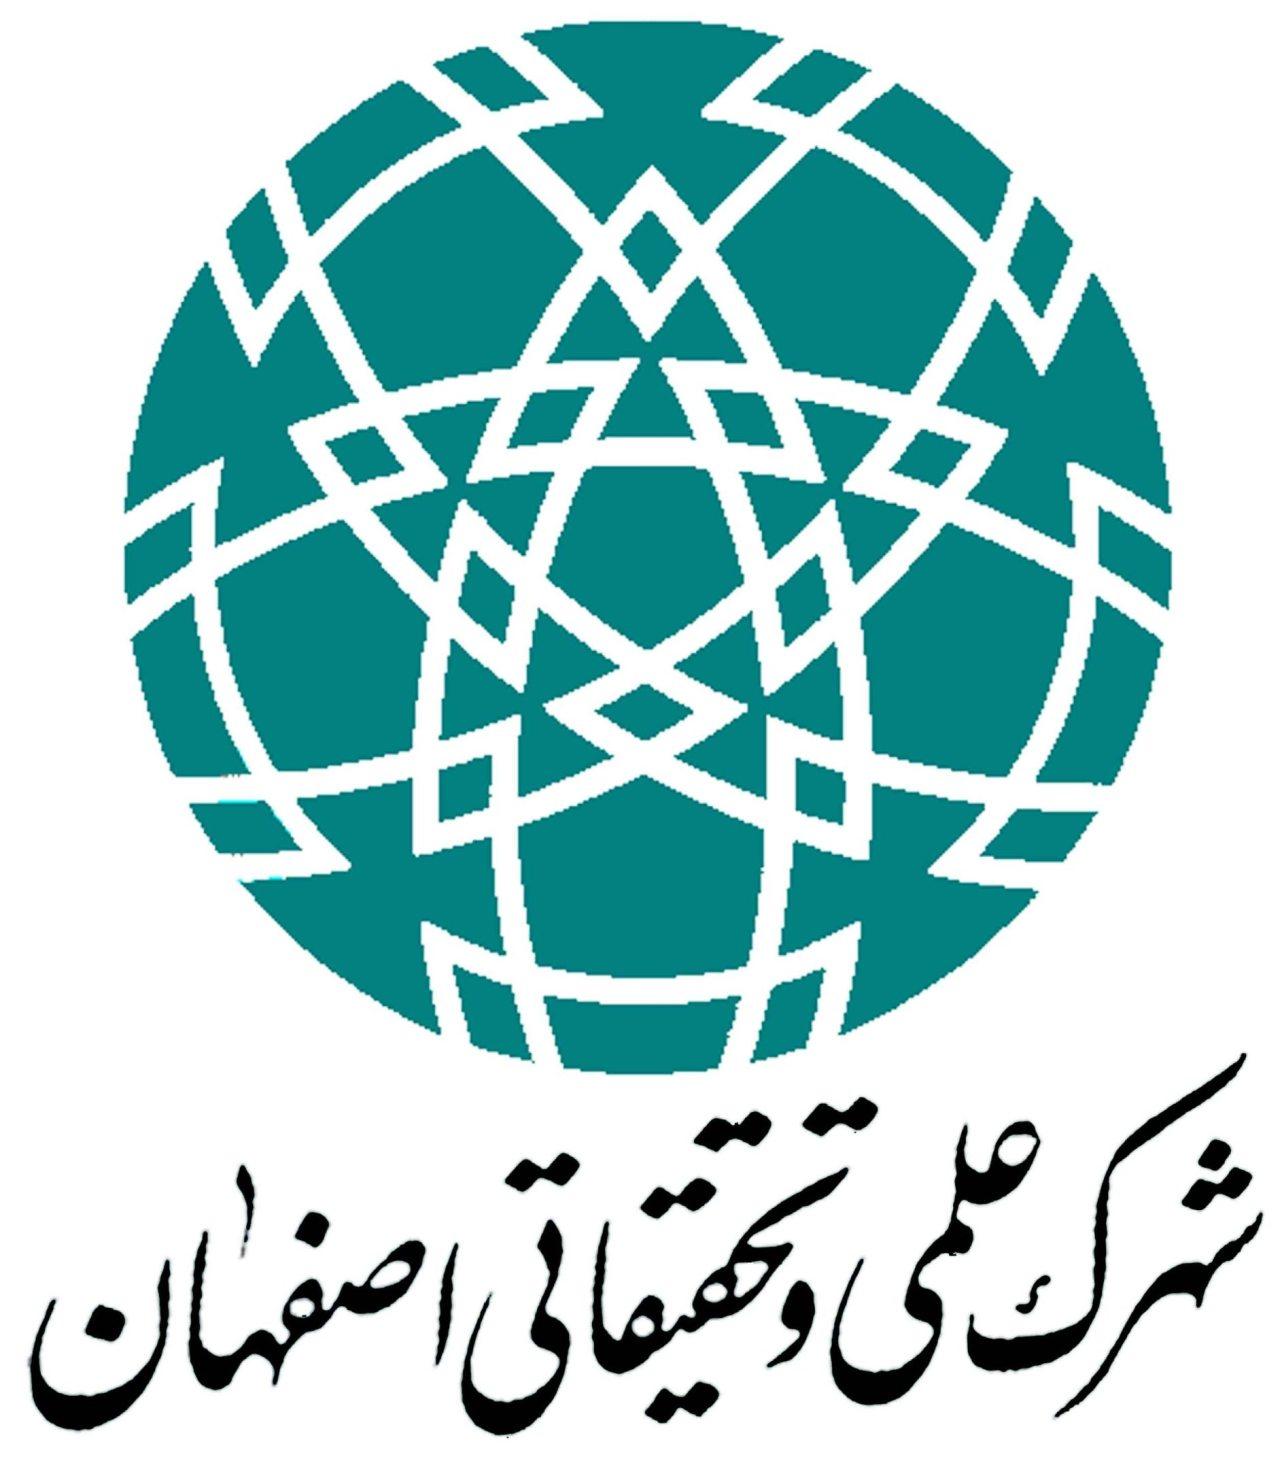 logo_ideashow_155_485